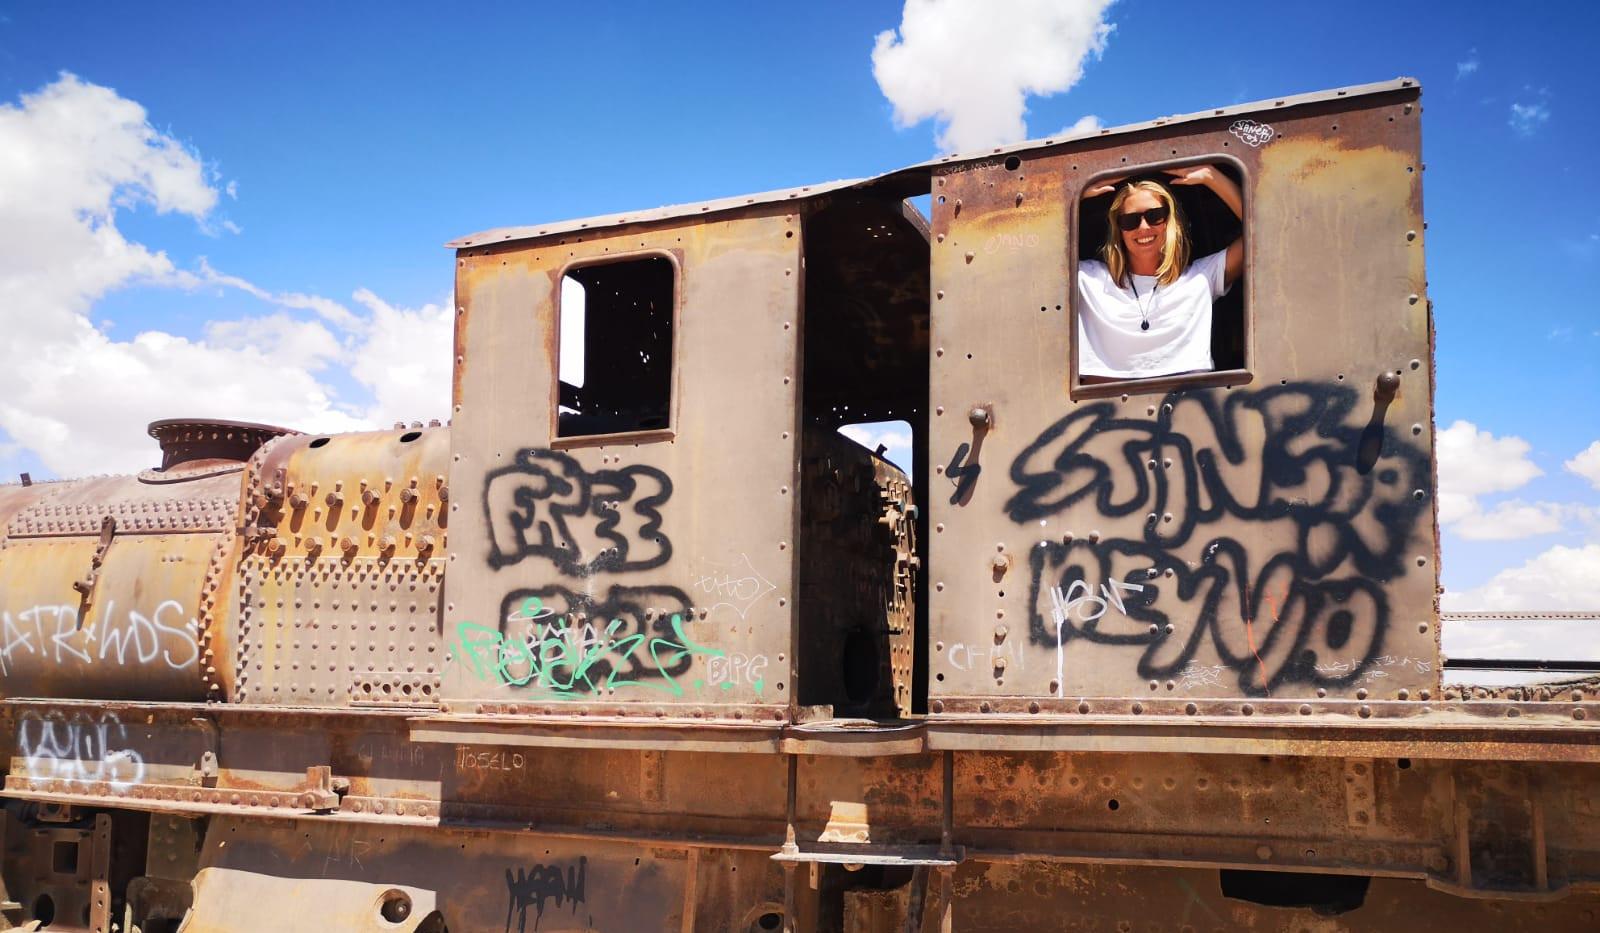 _Le train et la conductrice_